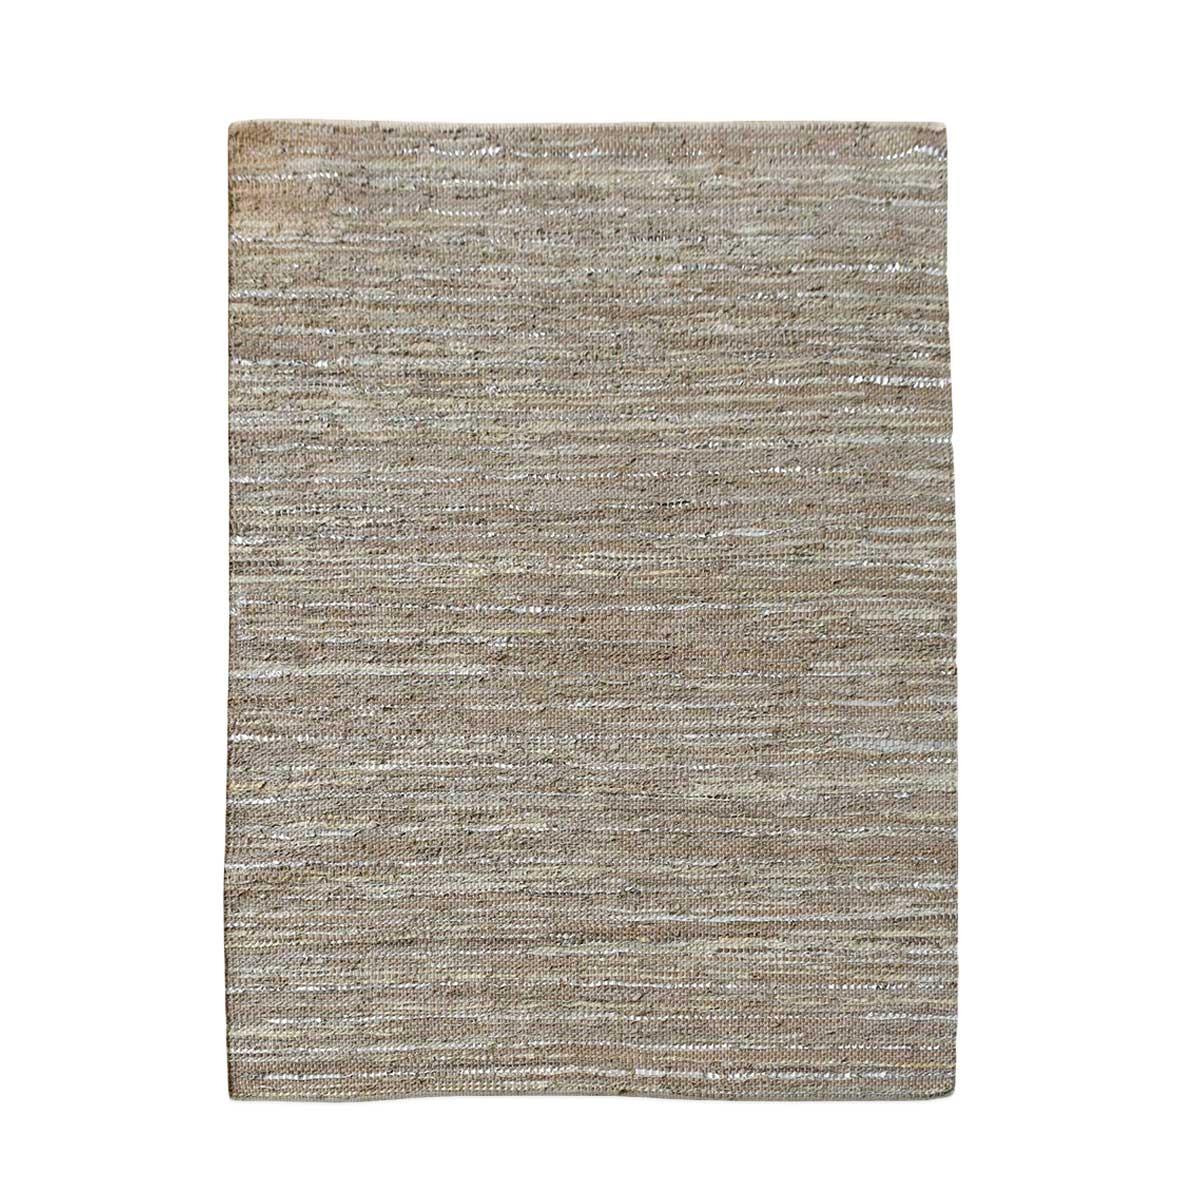 Ayan-Best-Selling-Handmade-Carpet-Online-CozyHome-Dubai-min